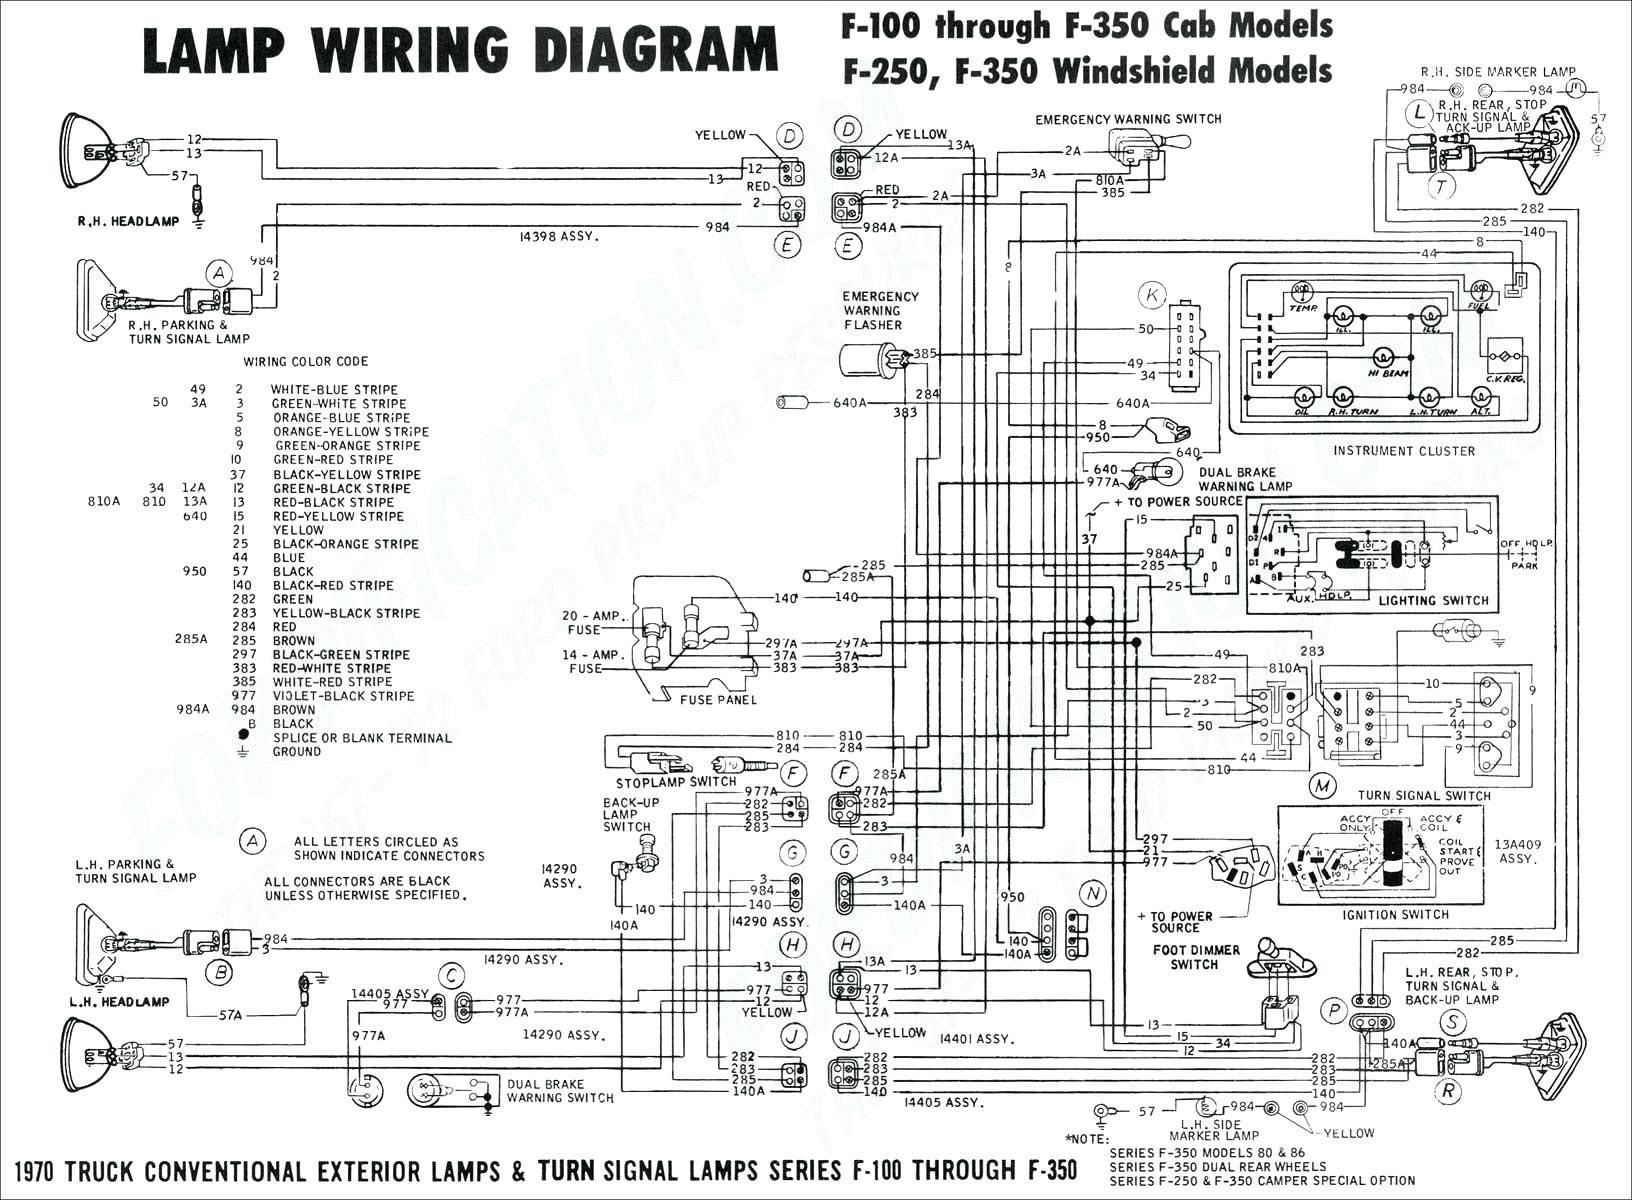 Saab 93 Stereo Wiring Pool Light Wiring Diagram